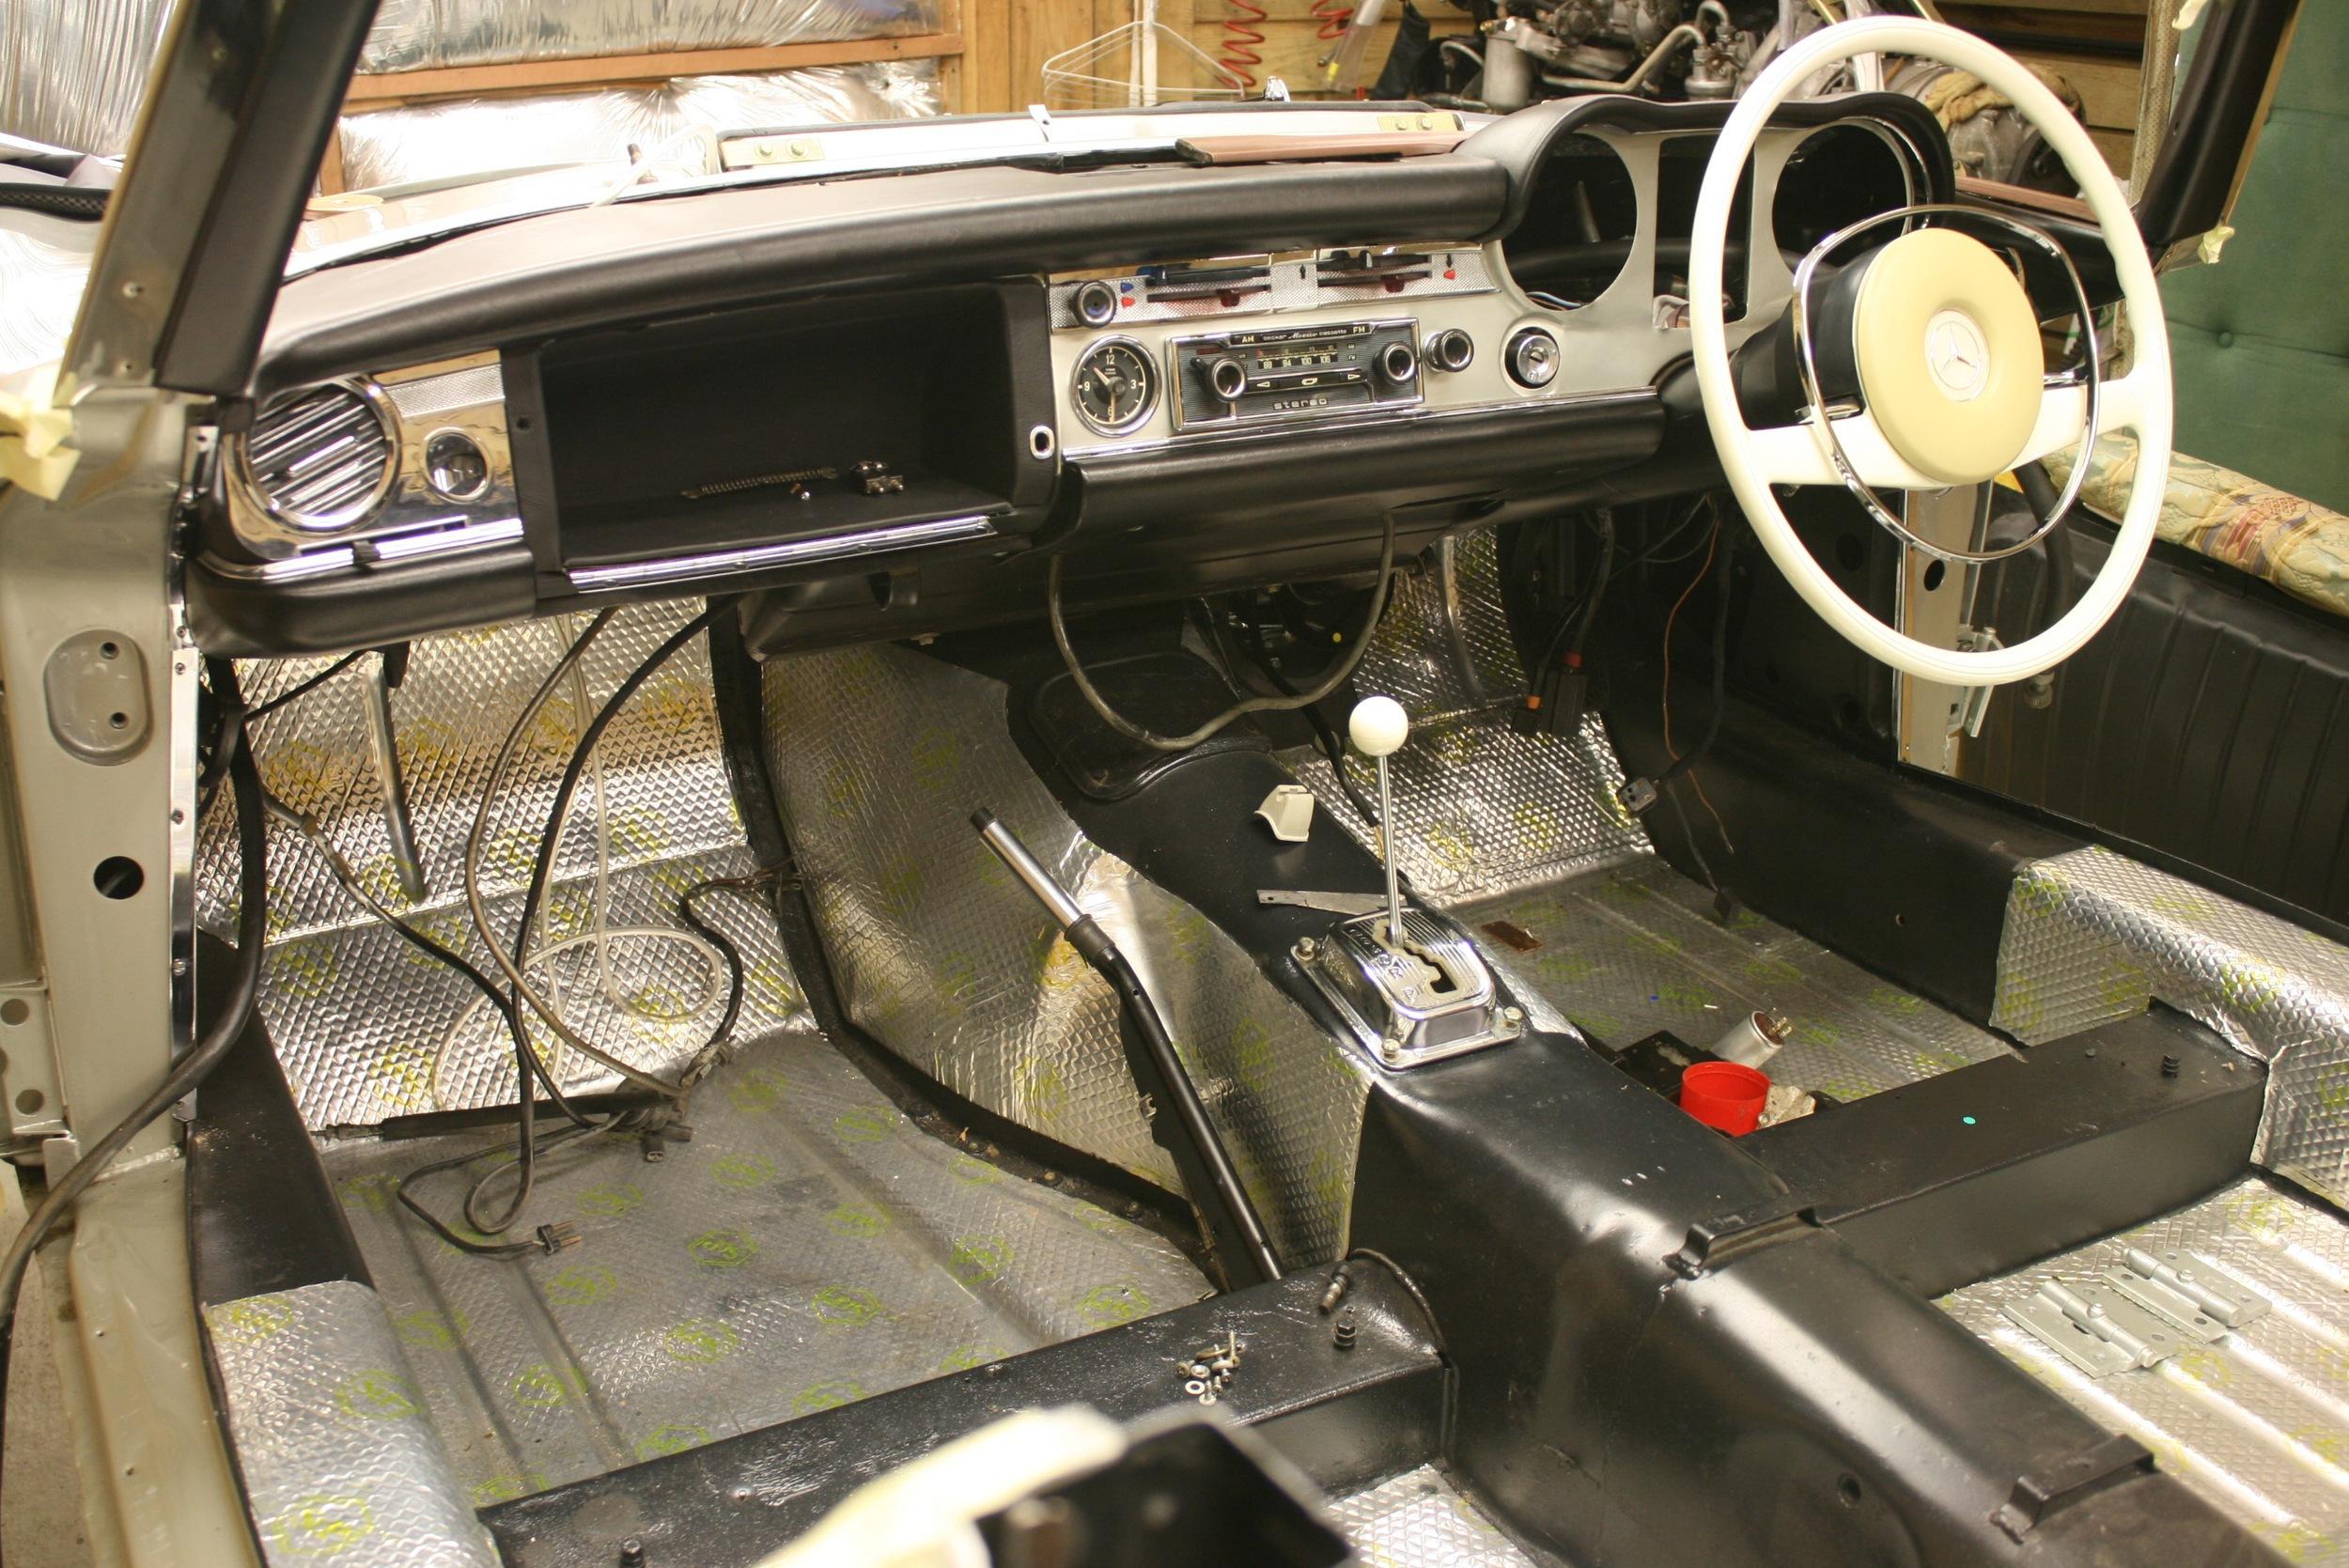 dash re assembly begins, including restored ivory steering wheel